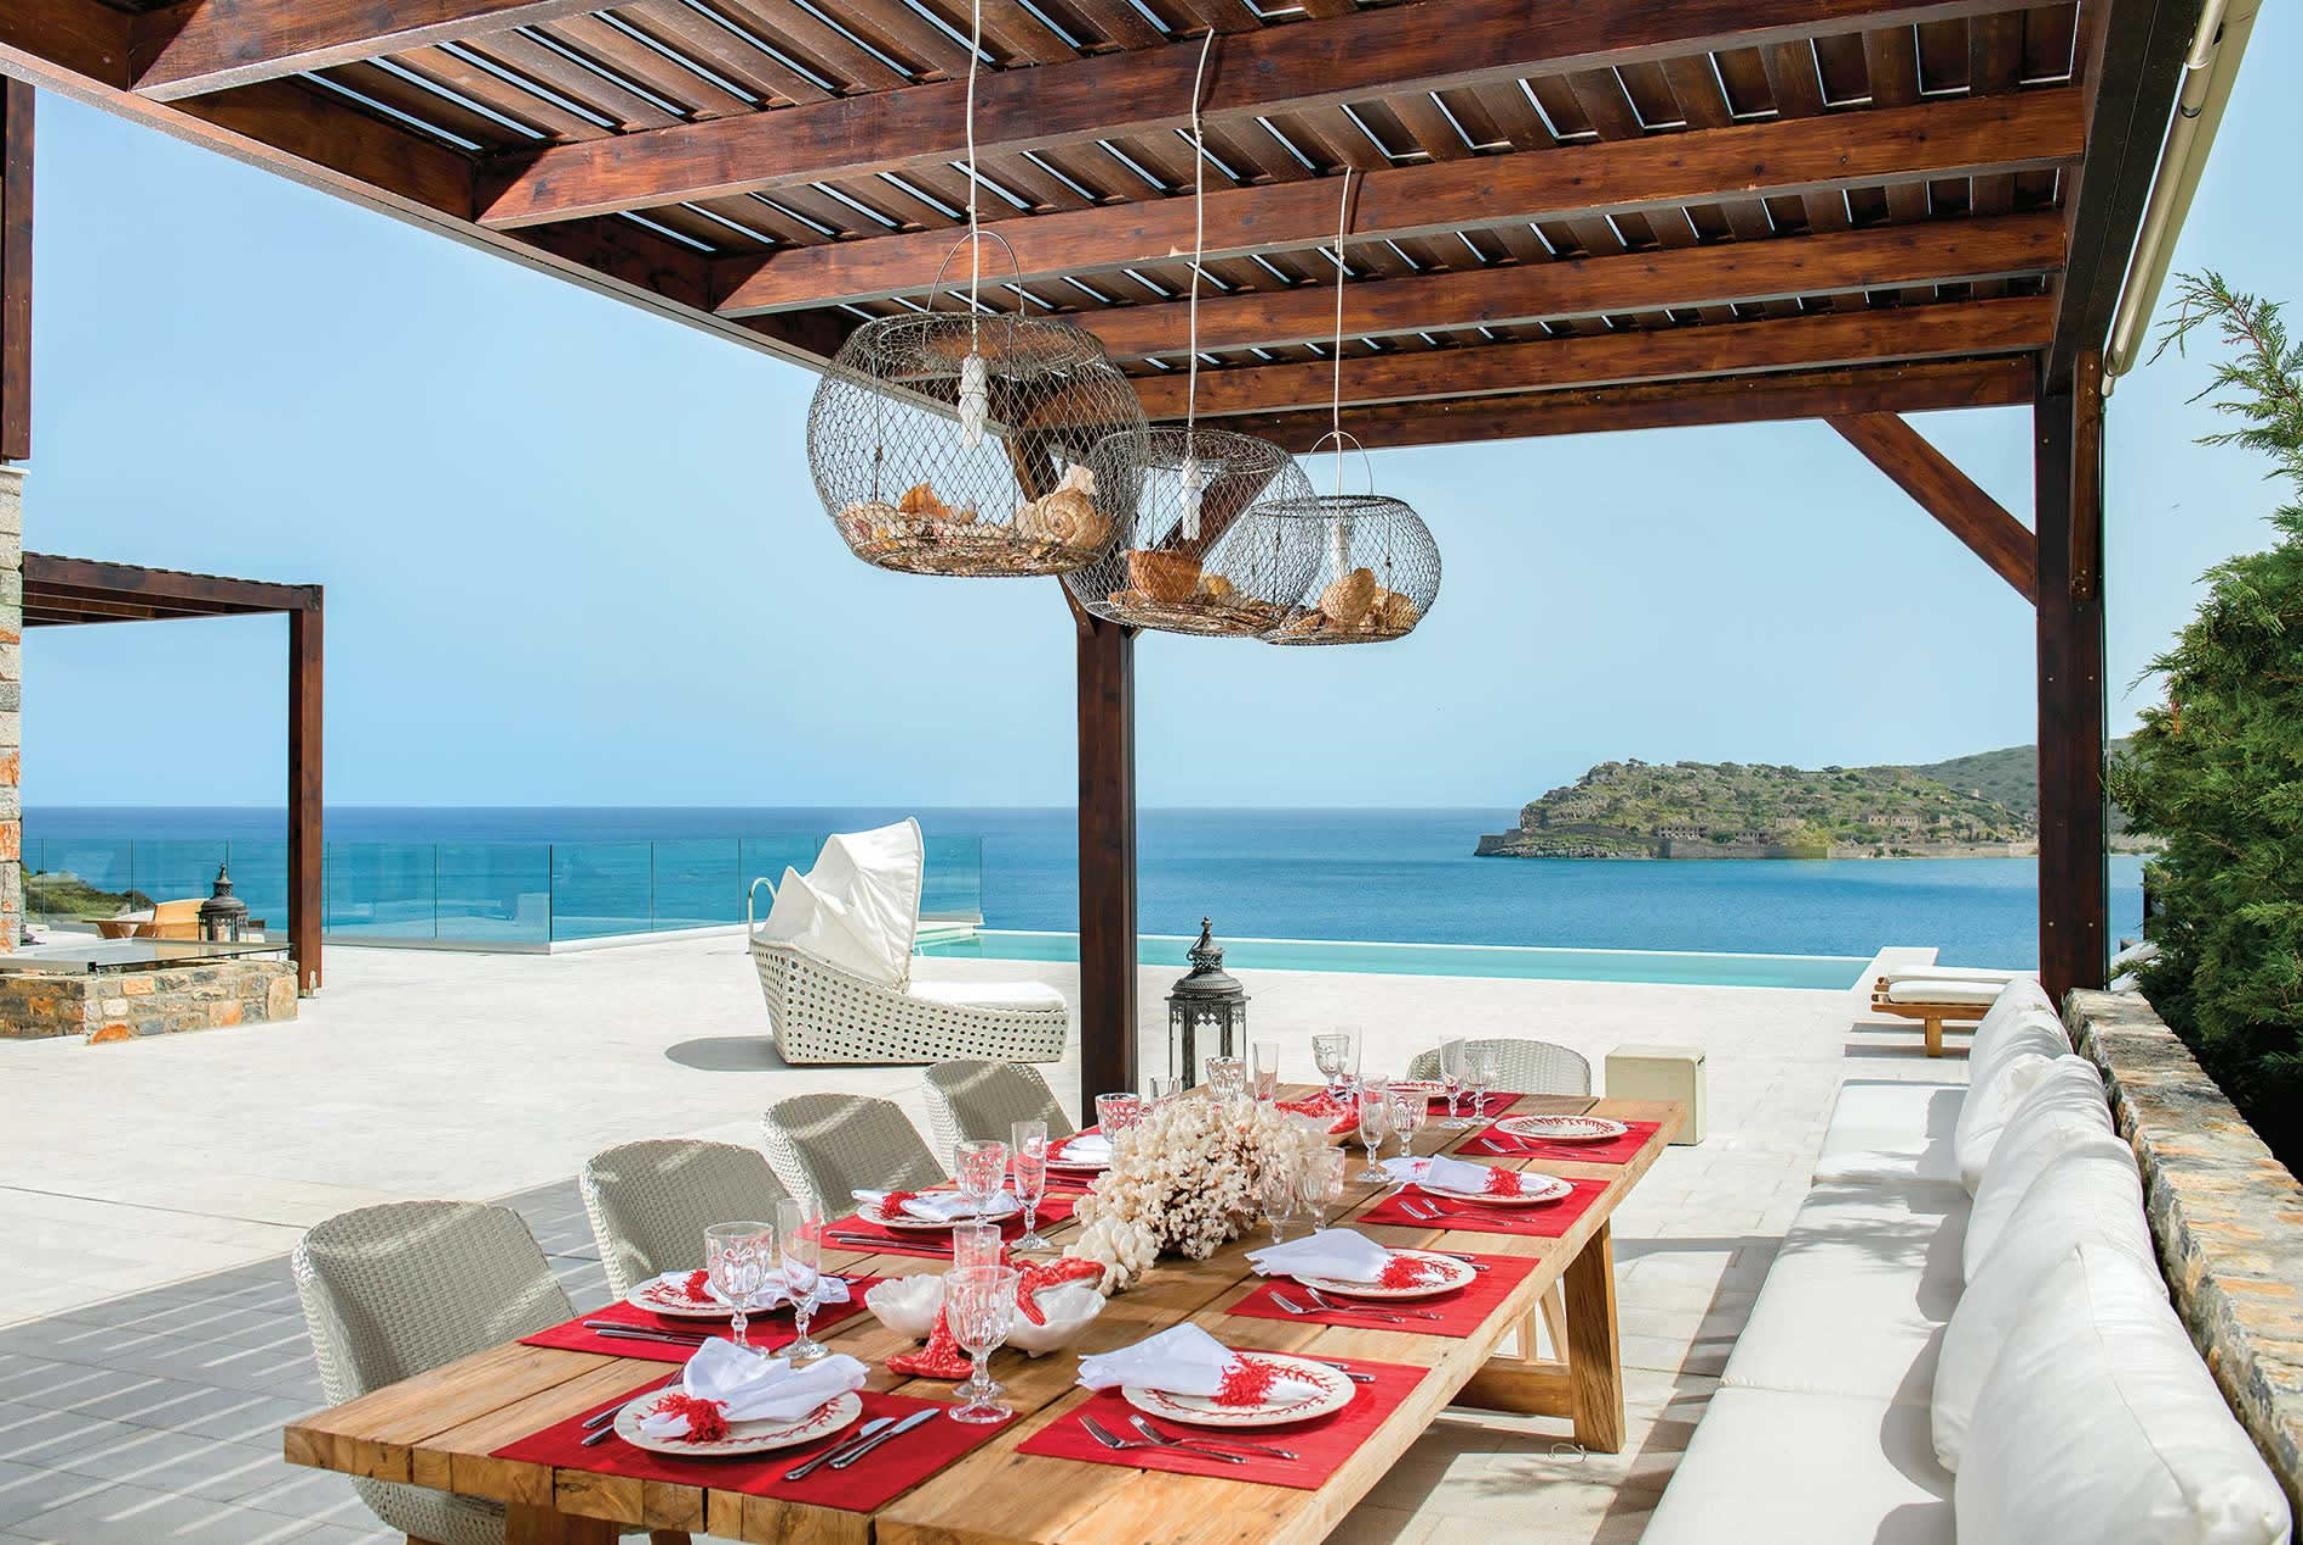 Ferienhaus Danae (2654195), Plaka, Kreta Nordküste, Kreta, Griechenland, Bild 15